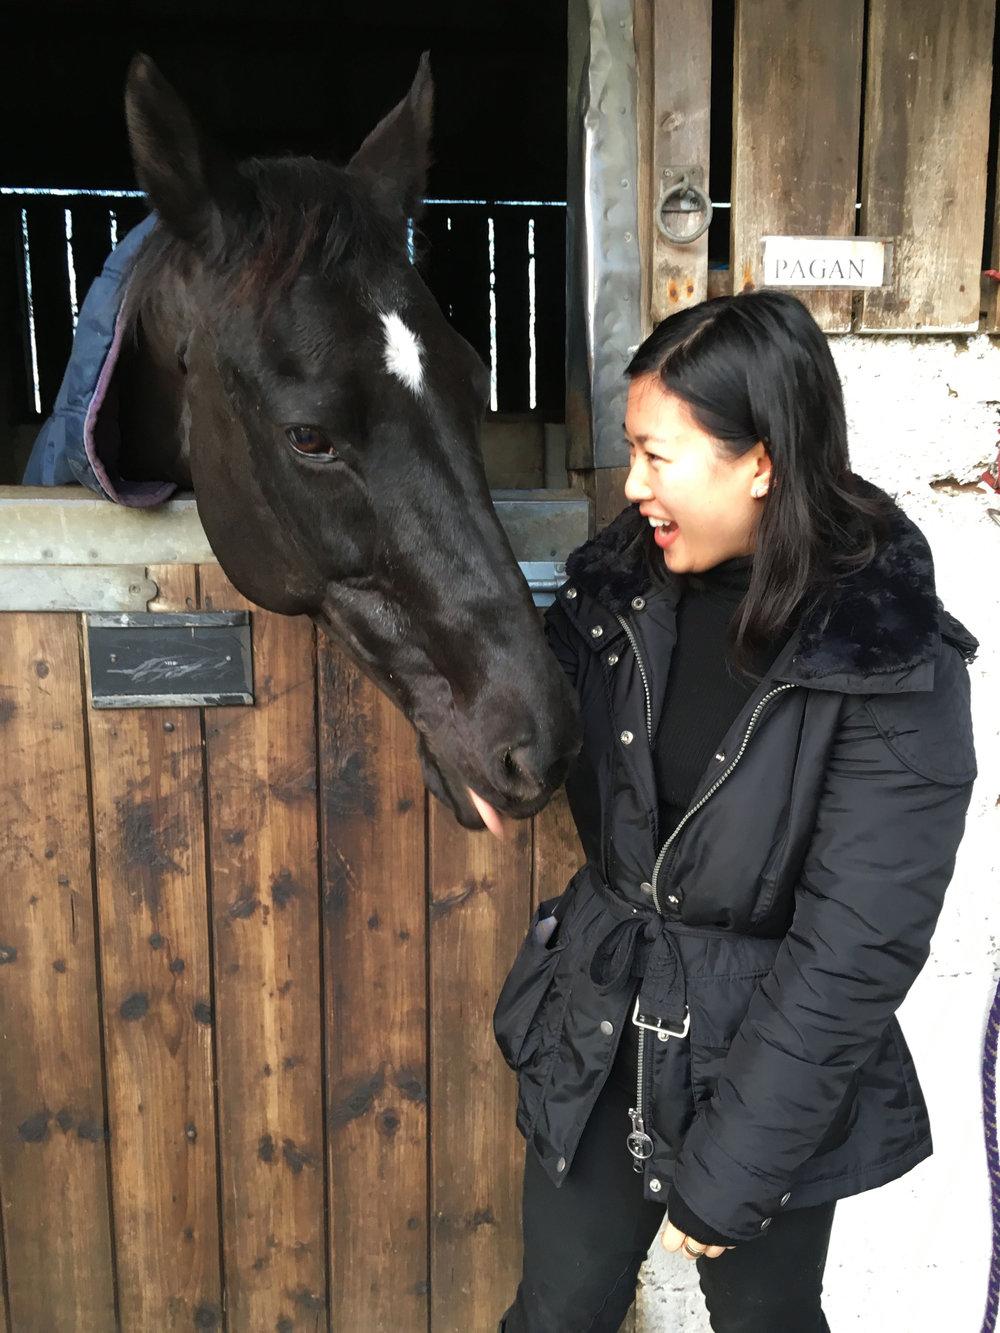 Lozidaze_Cotswolds_Horse_01